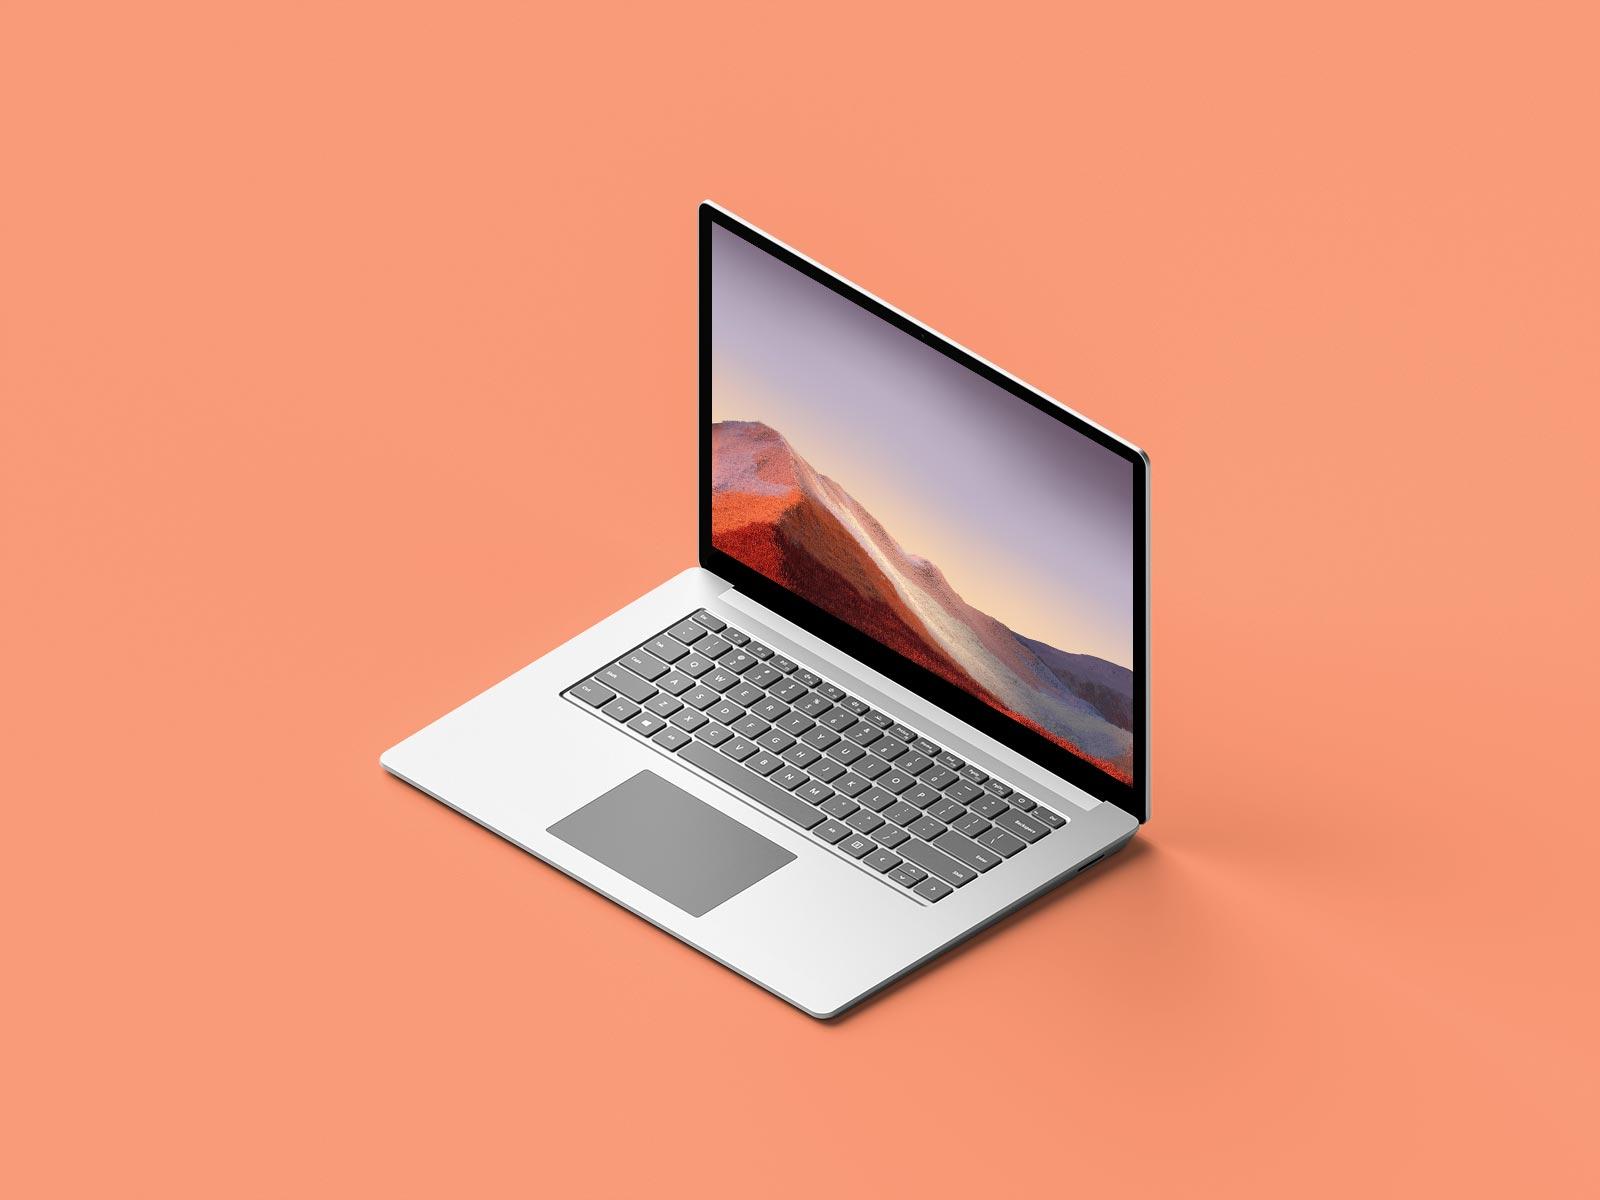 Free-Isometric-Microsoft-Surface-Laptop-Mockup-PSD-File